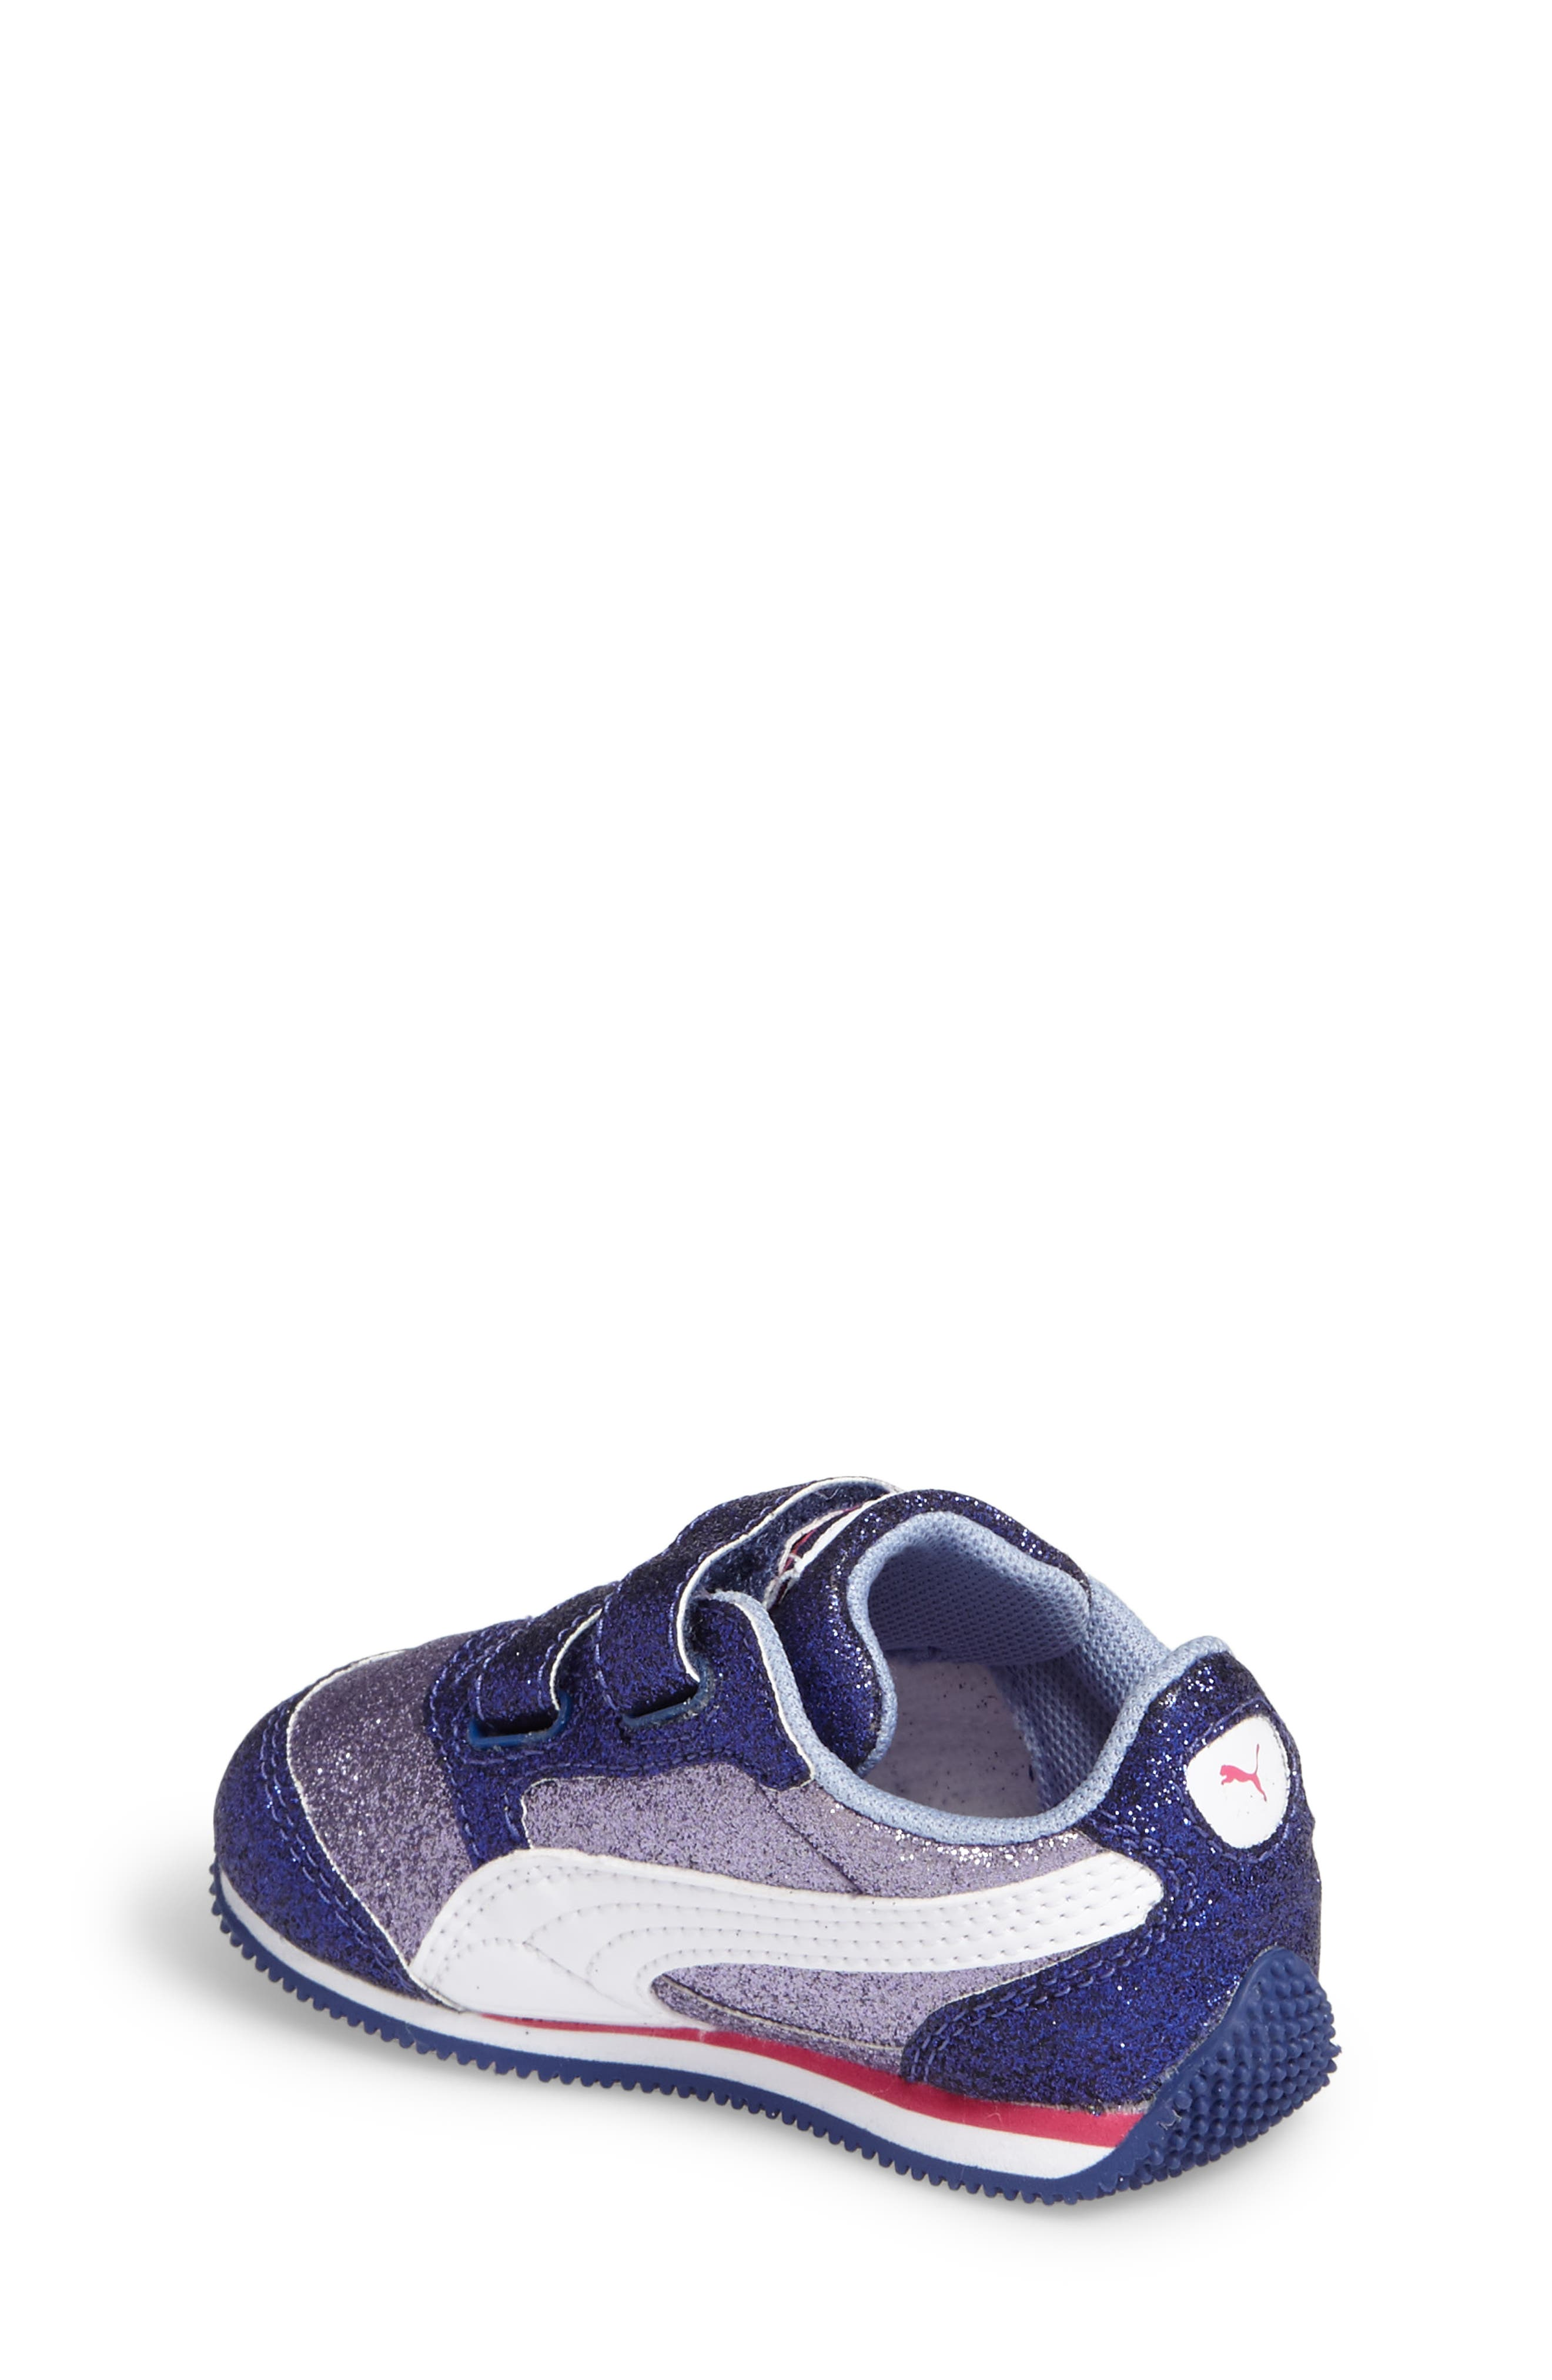 Steeple Glitz Glam Sneaker,                             Alternate thumbnail 2, color,                             Lavender